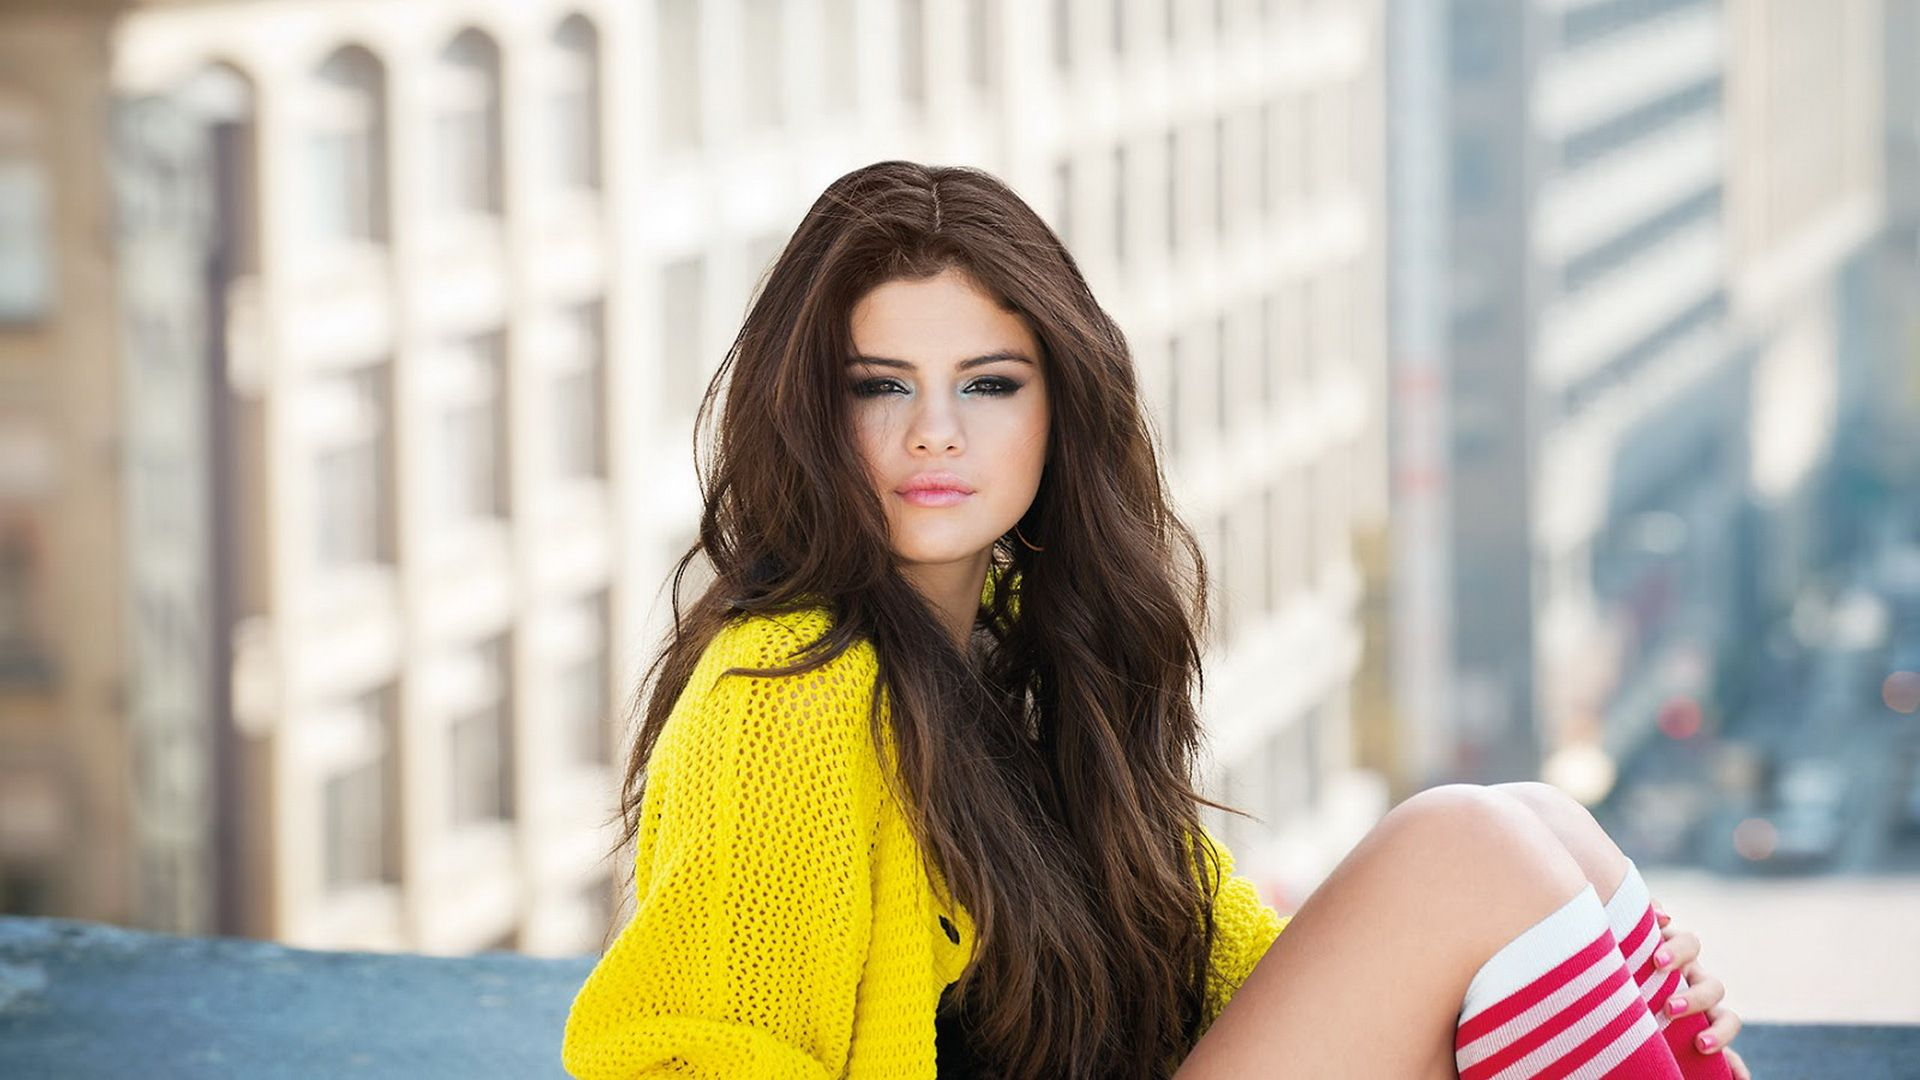 Selena Gomez 2013 HD